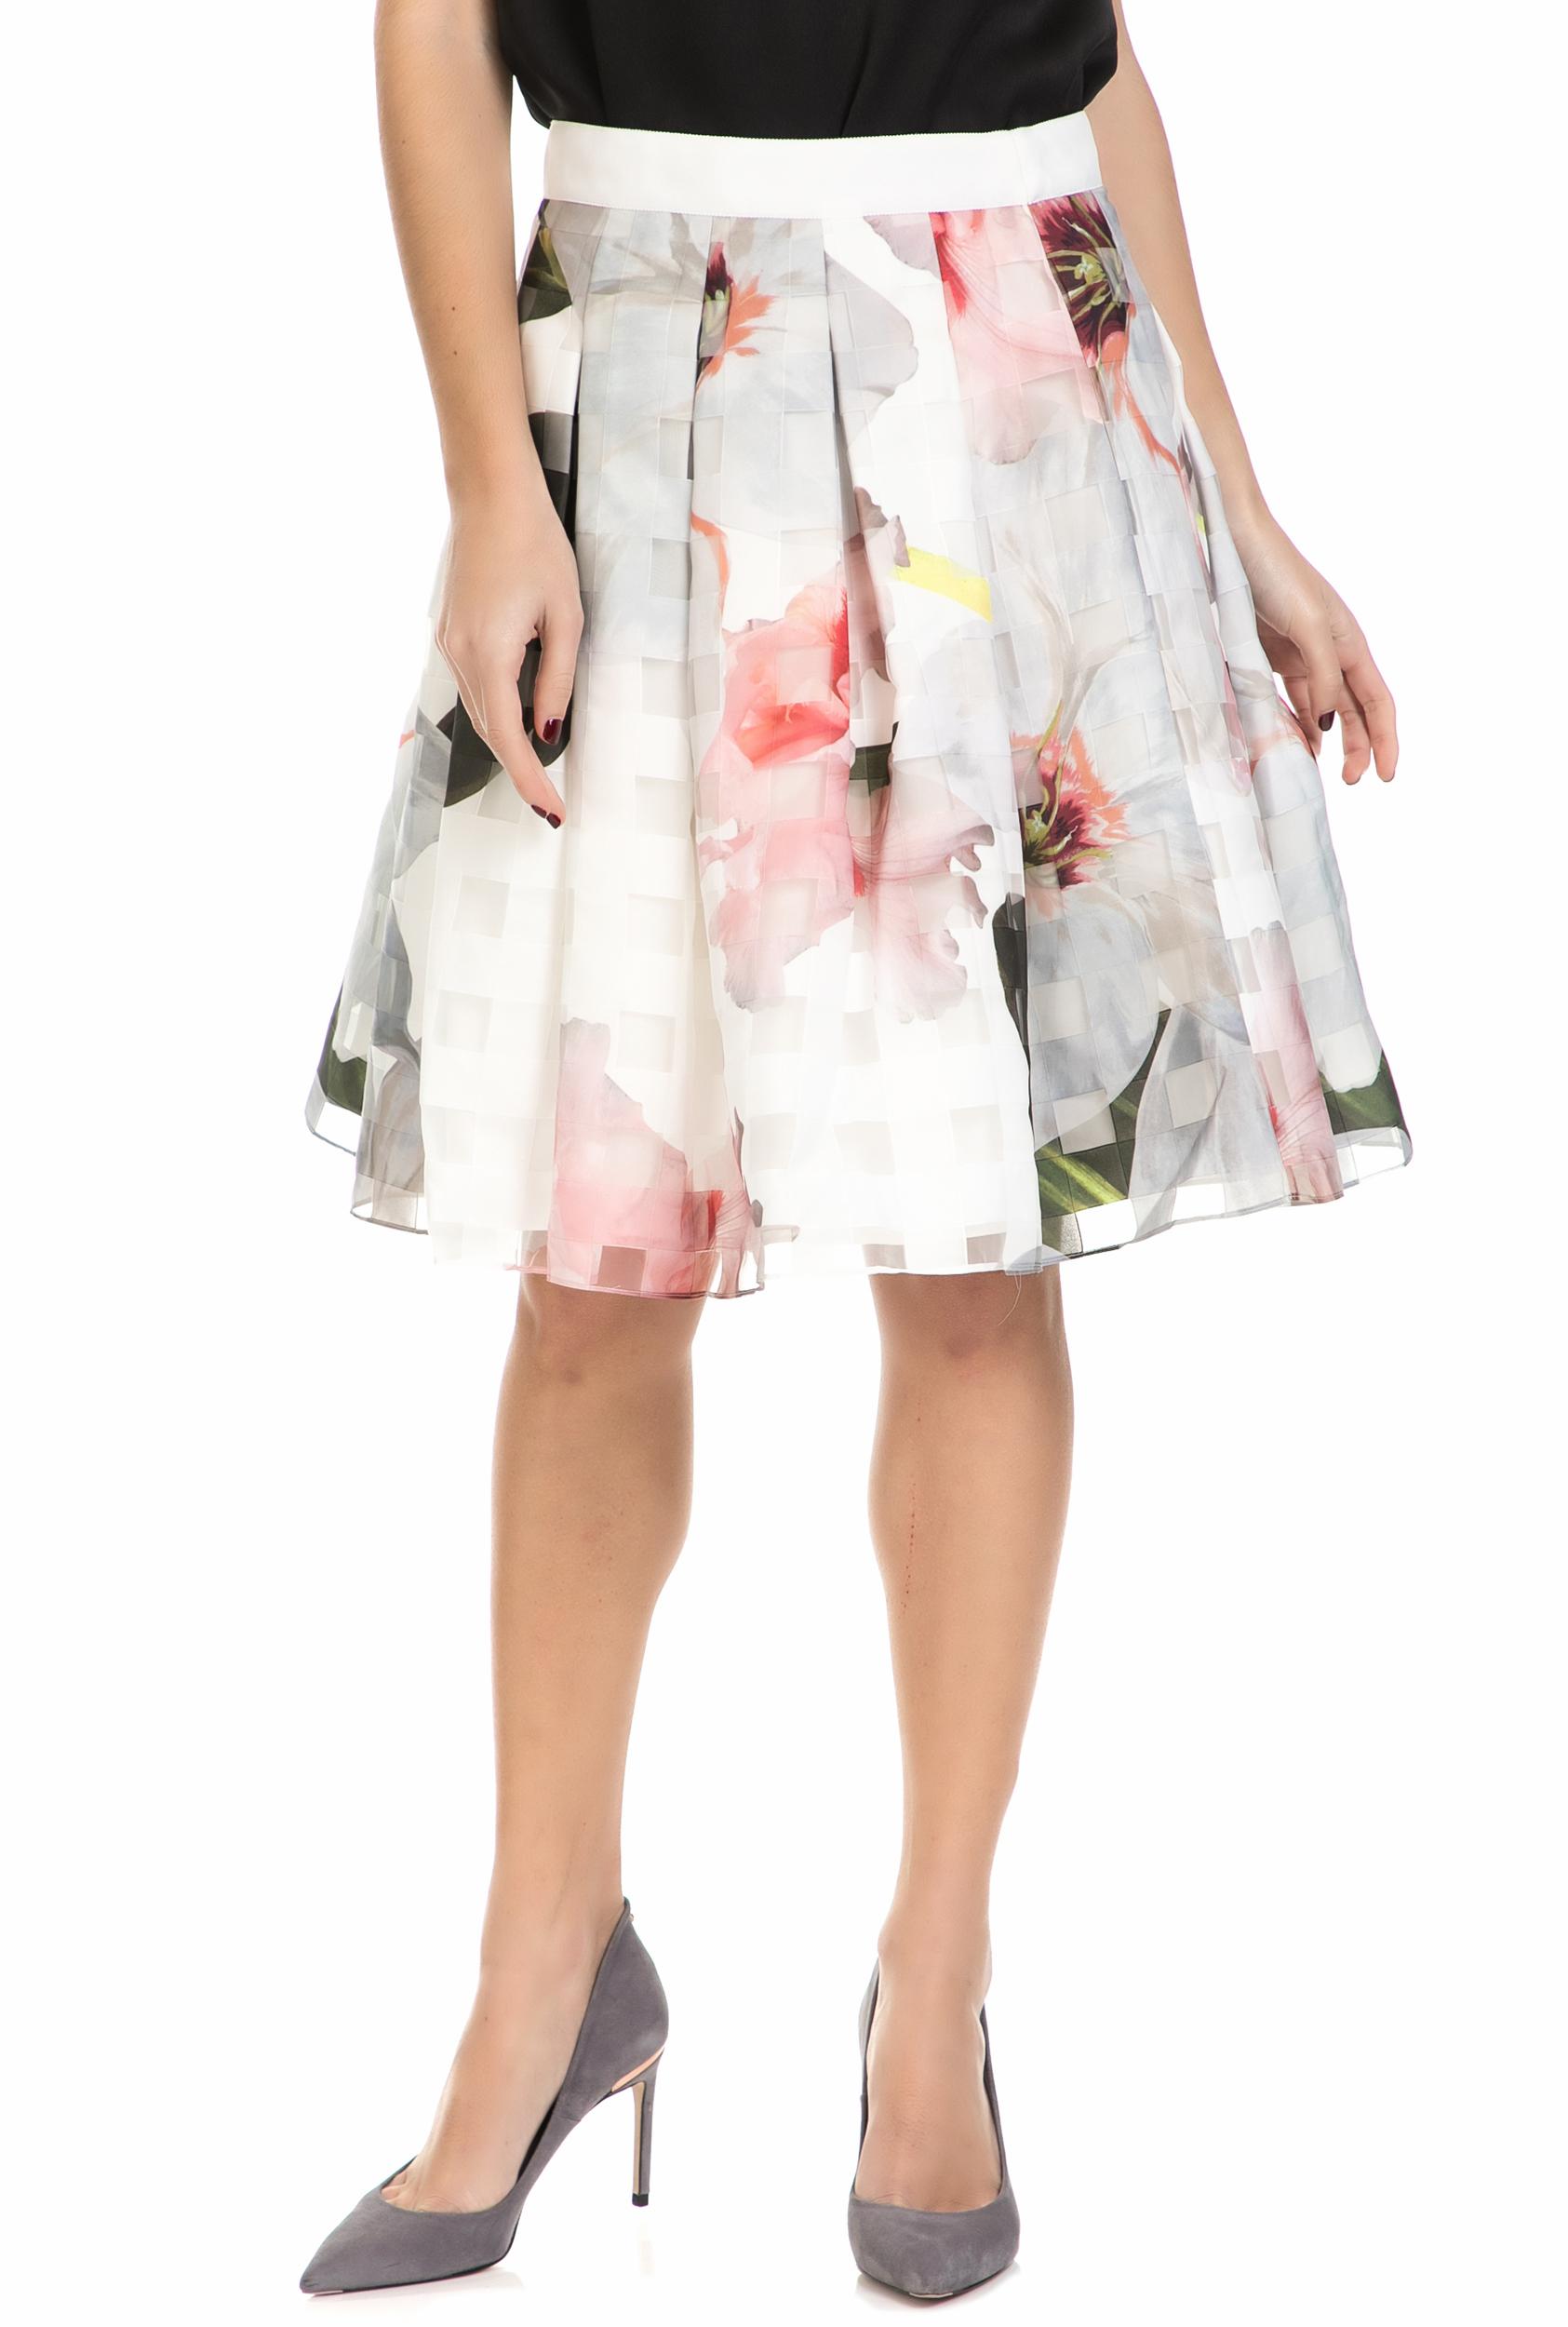 877e4ef25d TED BAKER - Γυναικεία μίντι φούστα κλος VANTA BURNOUT CHATSWORTH ροζ φλοράλ